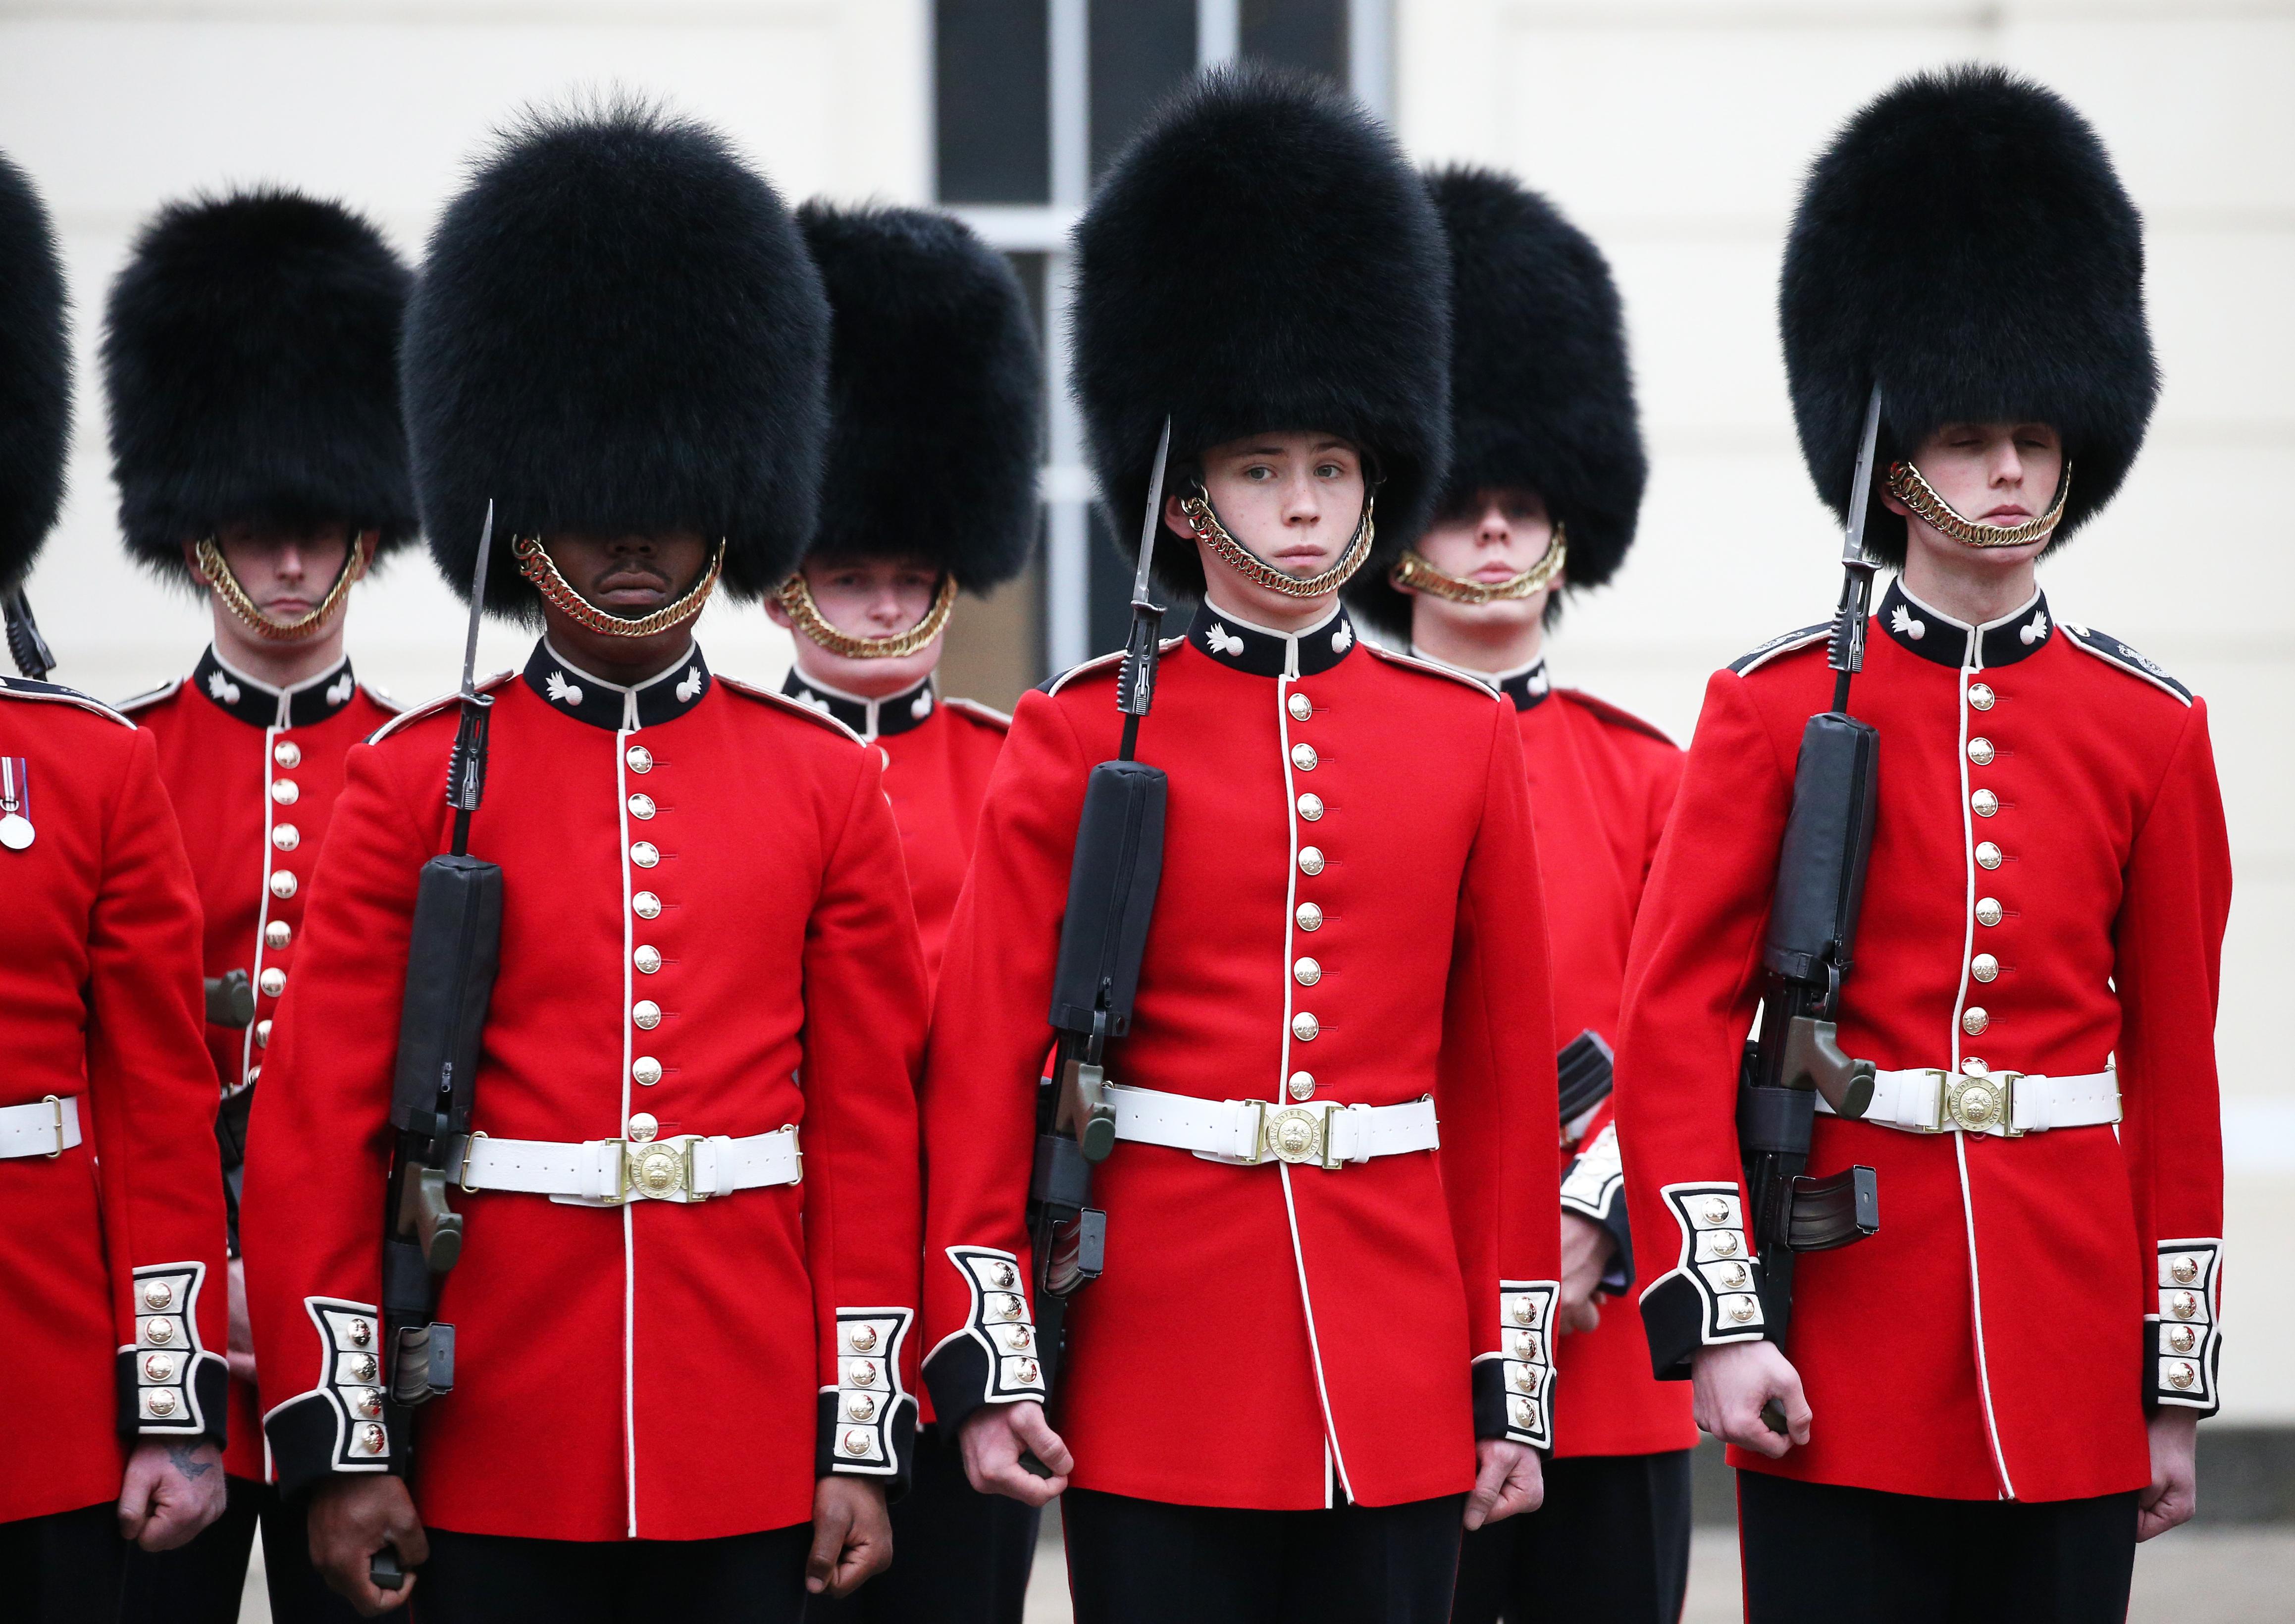 Grenadier Guards